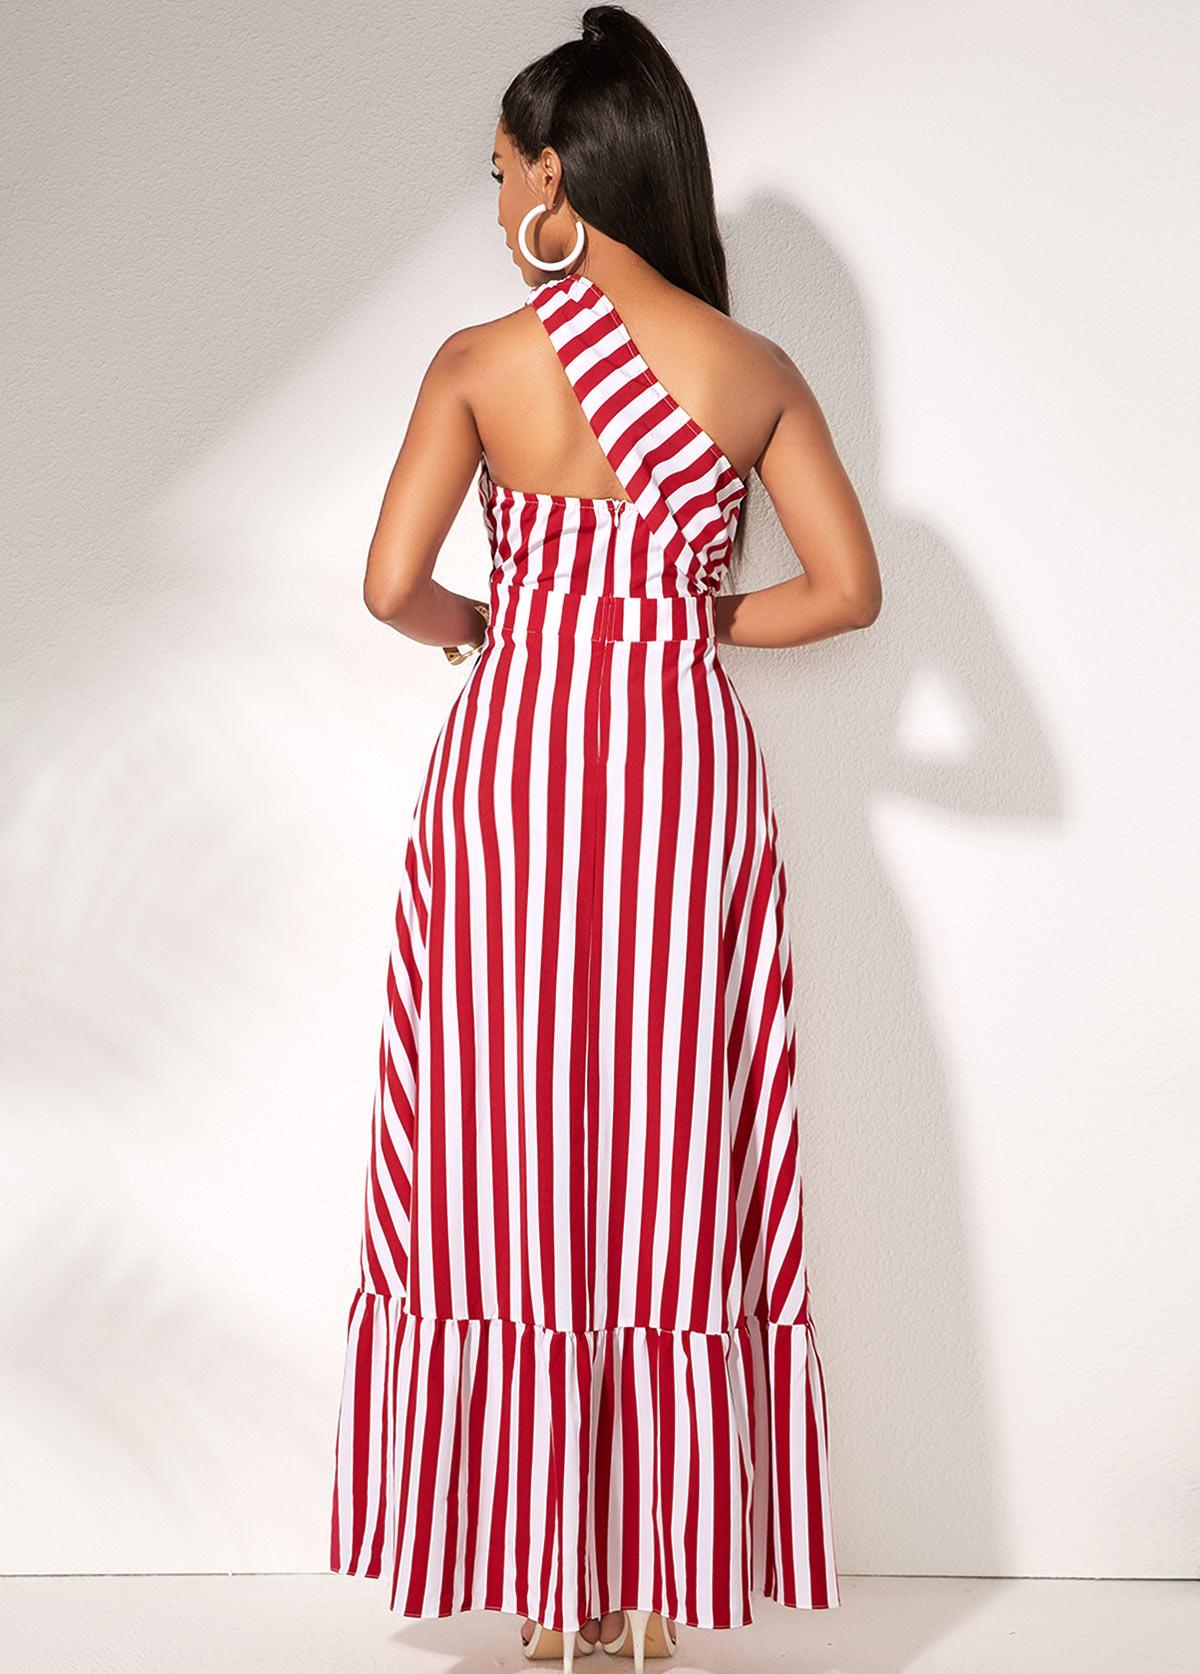 Sleeveless One Shoulder Striped Maxi Dress